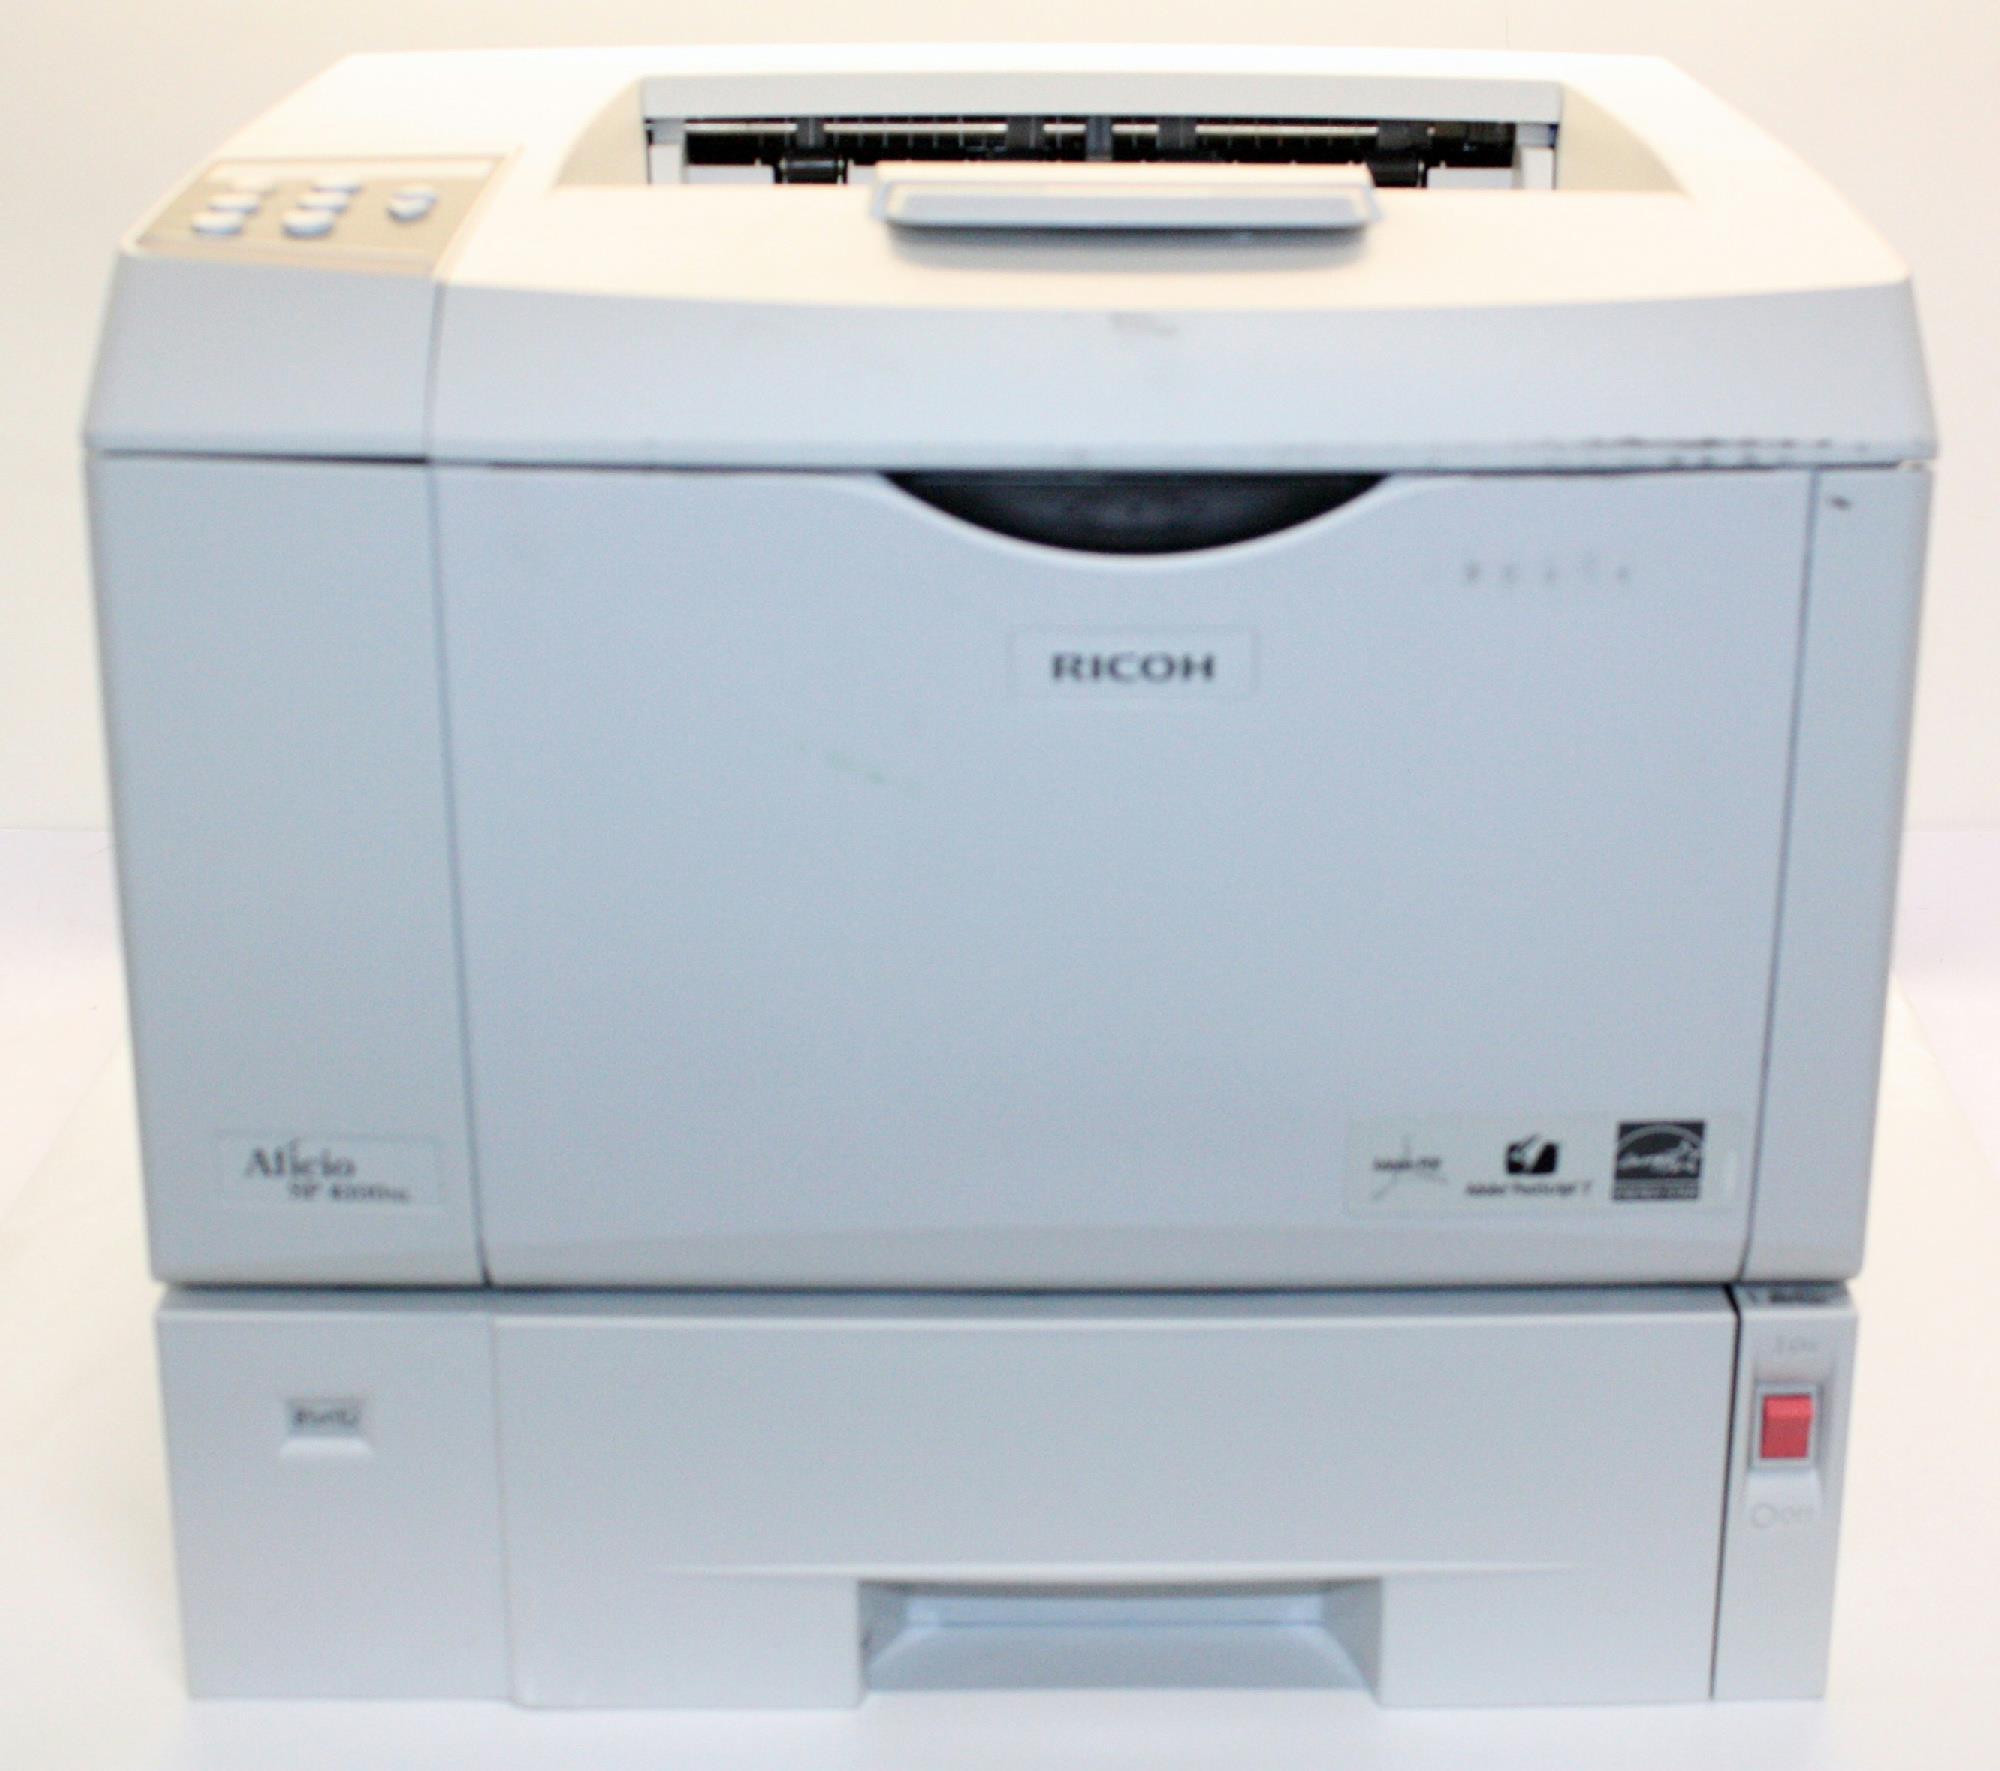 Ricoh Aficio SP 4100NL Multifunction PCL6 Treiber